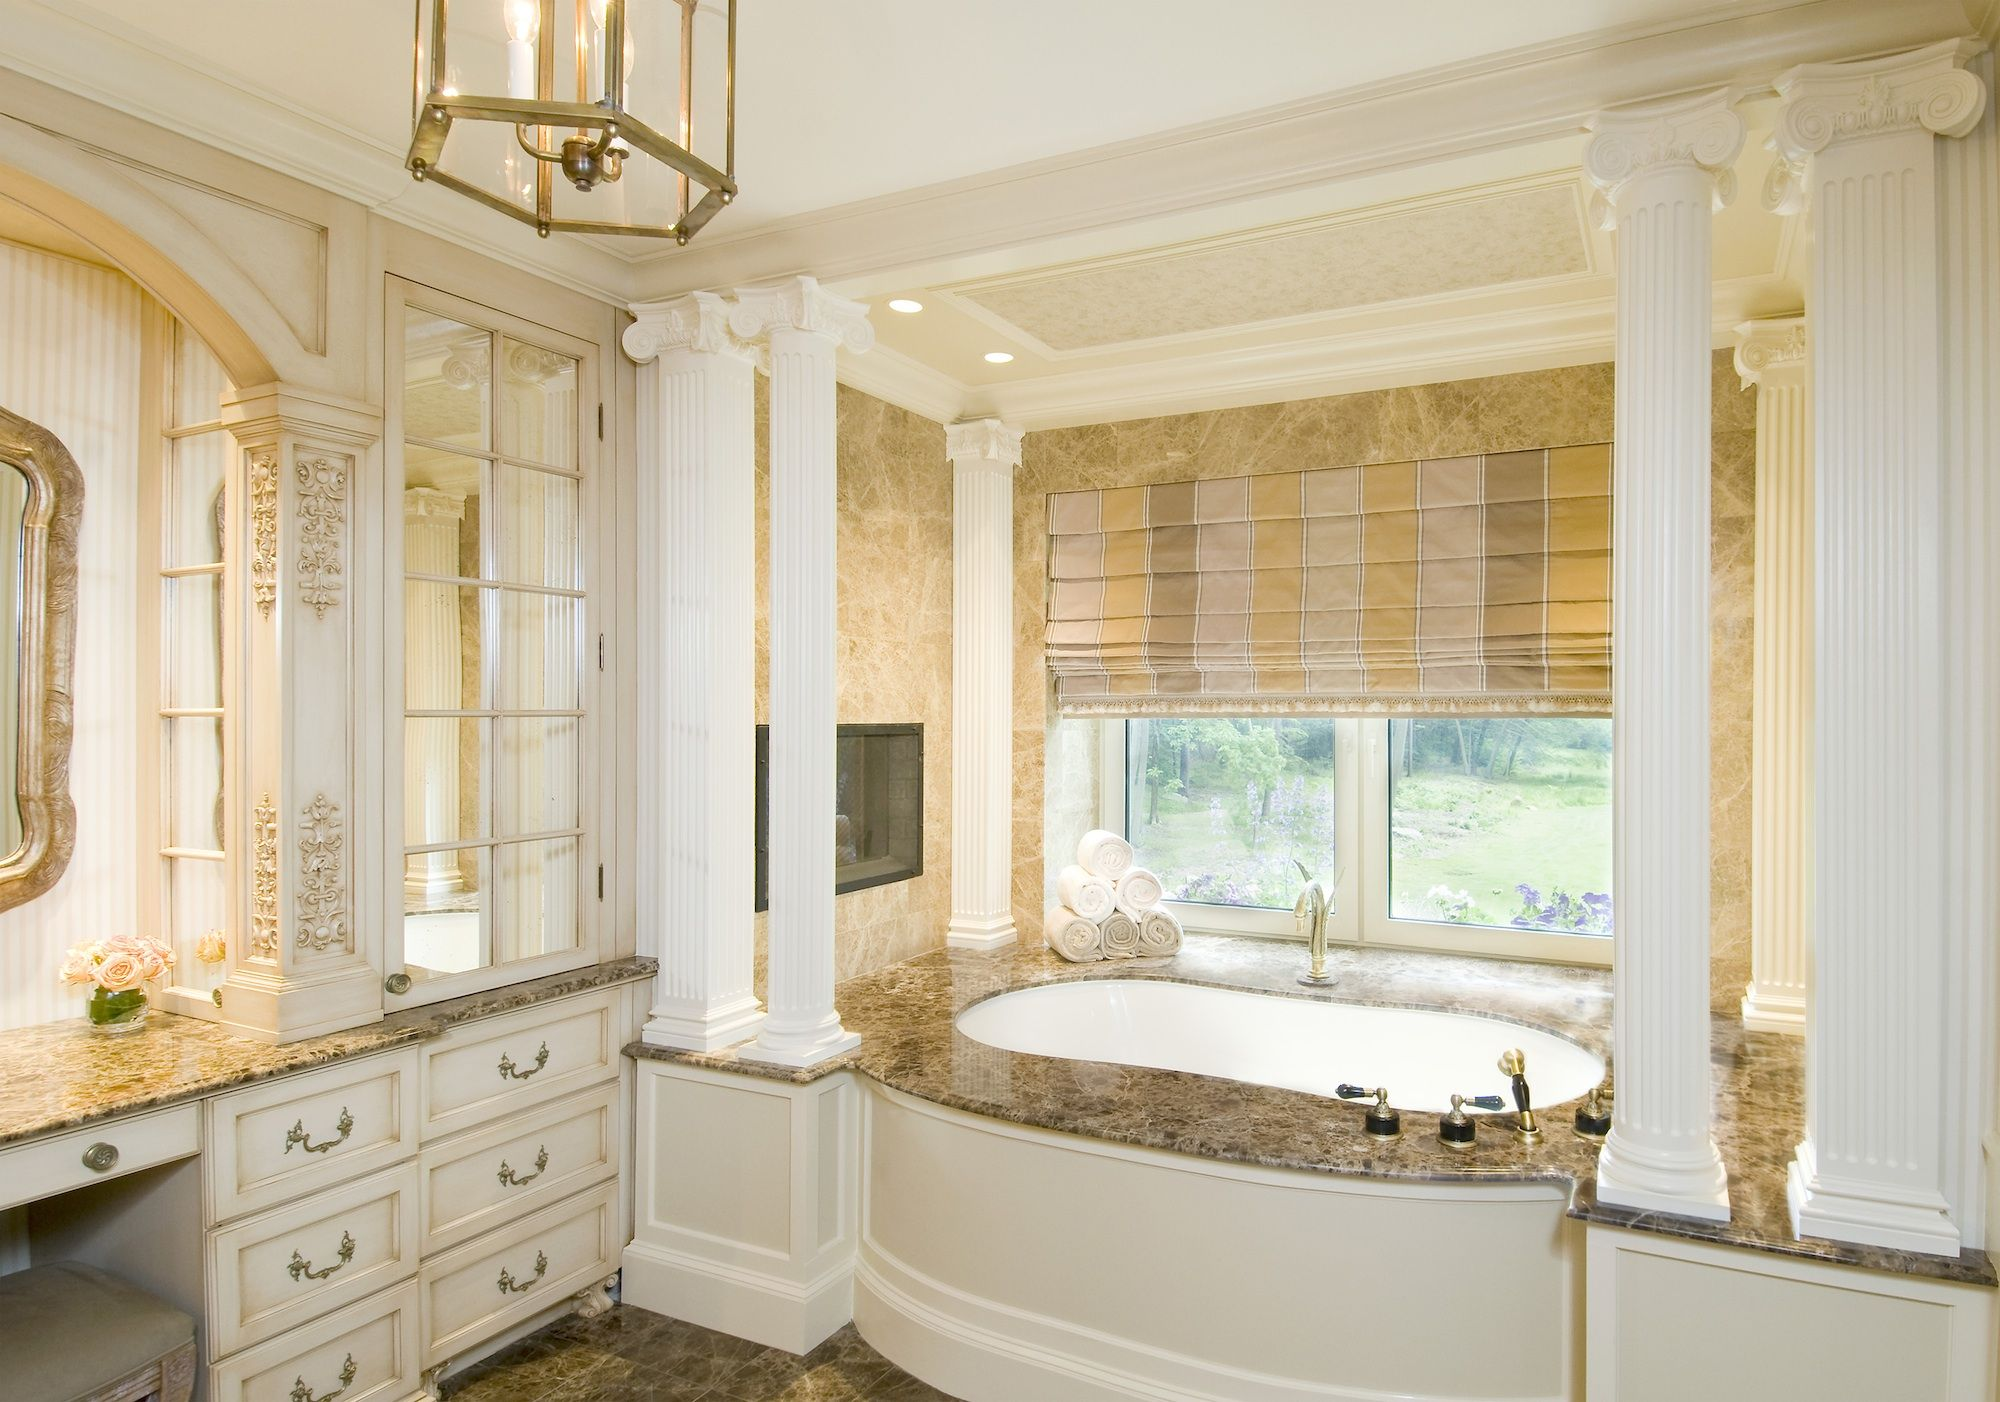 Minimalist Home Interior Design Bathroom Ideas For Small Space ...